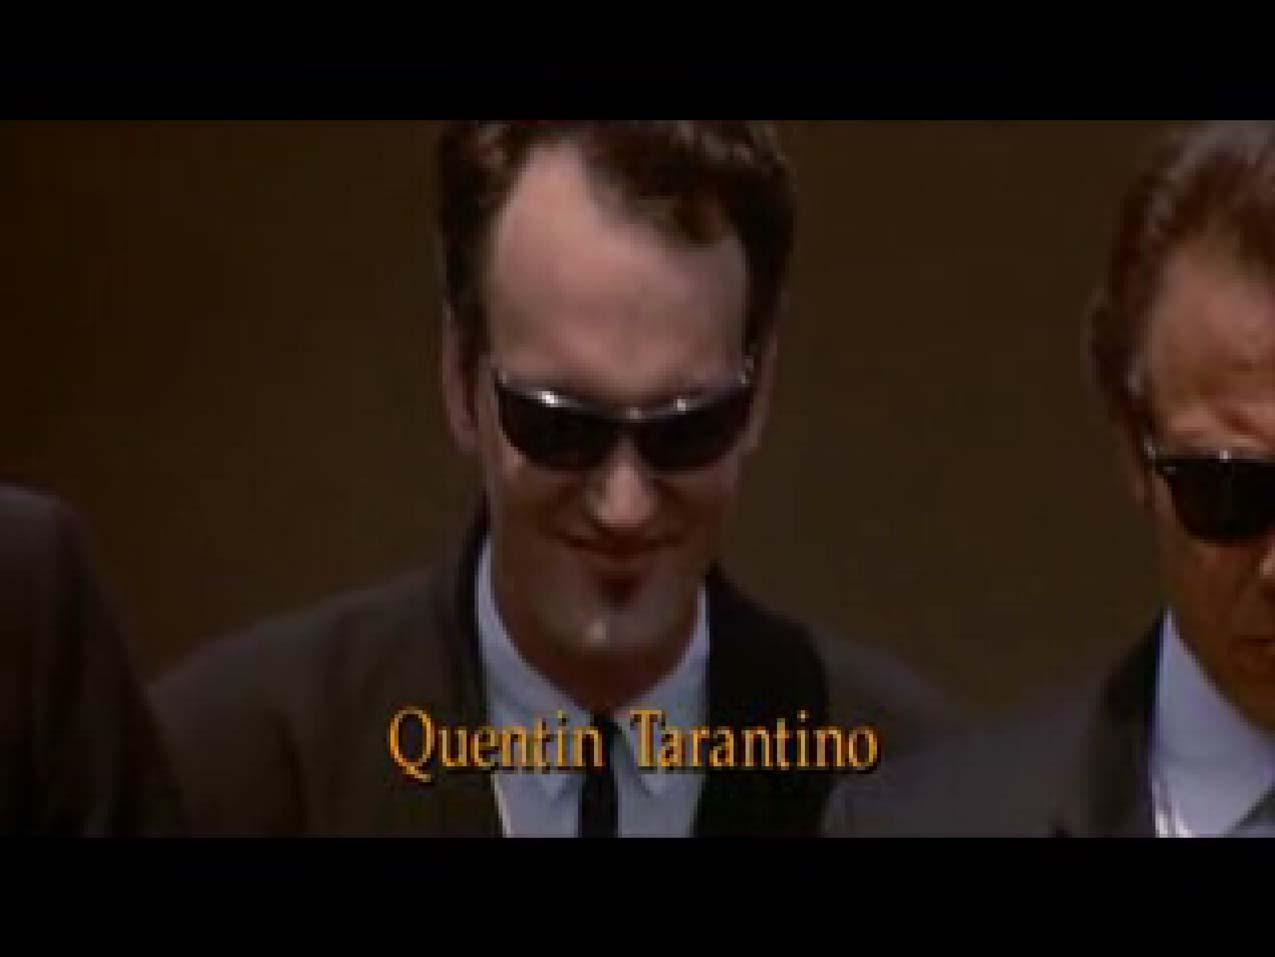 Quentin in Reservoir 개